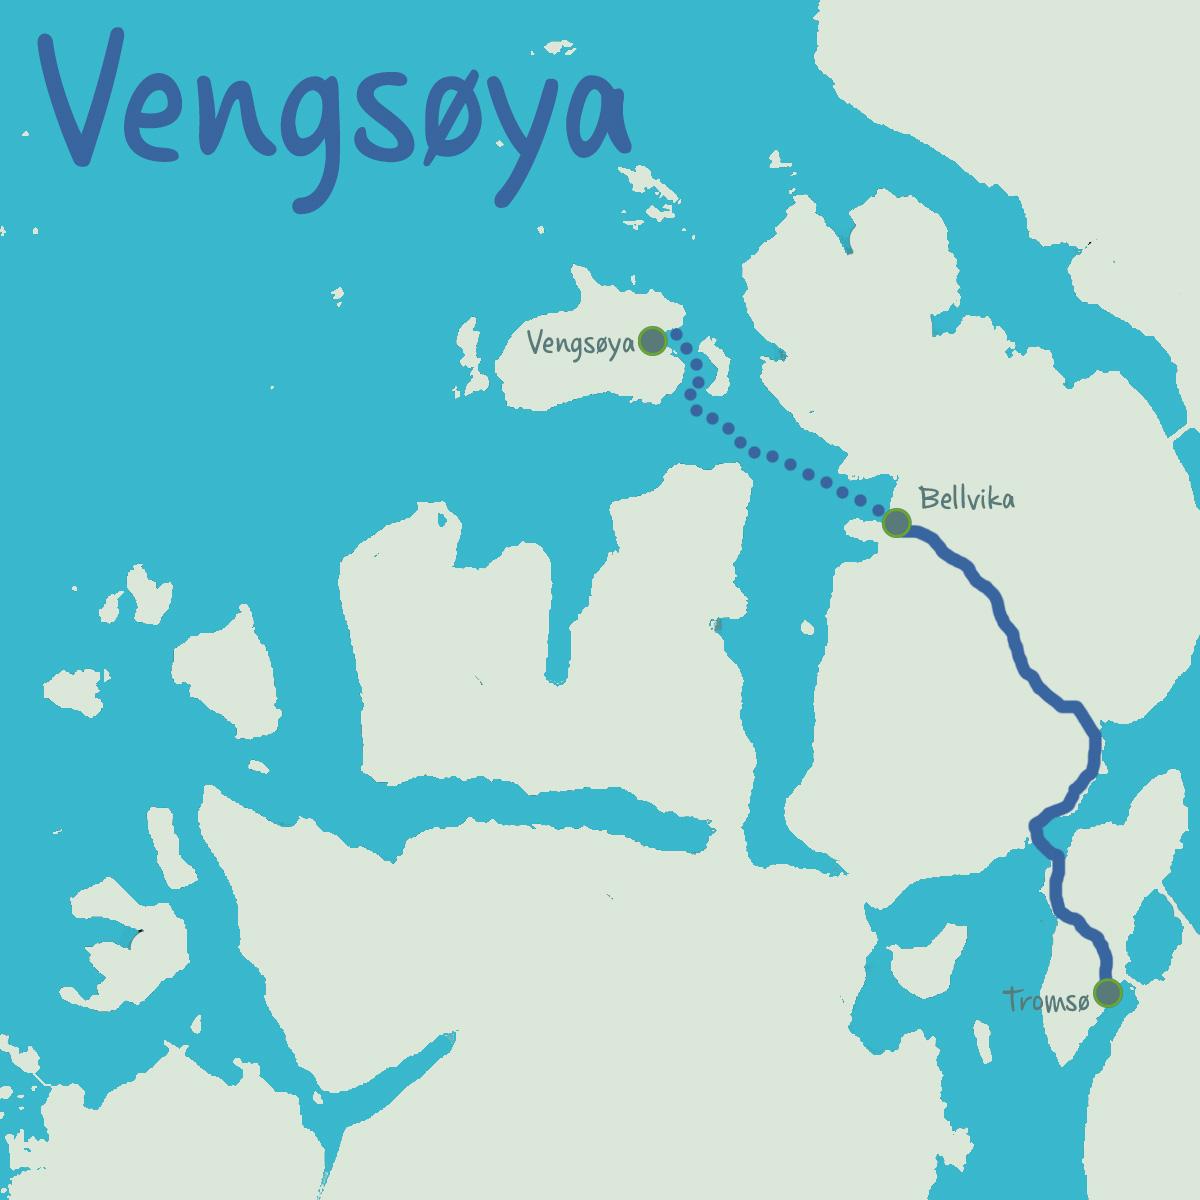 Vengsoya